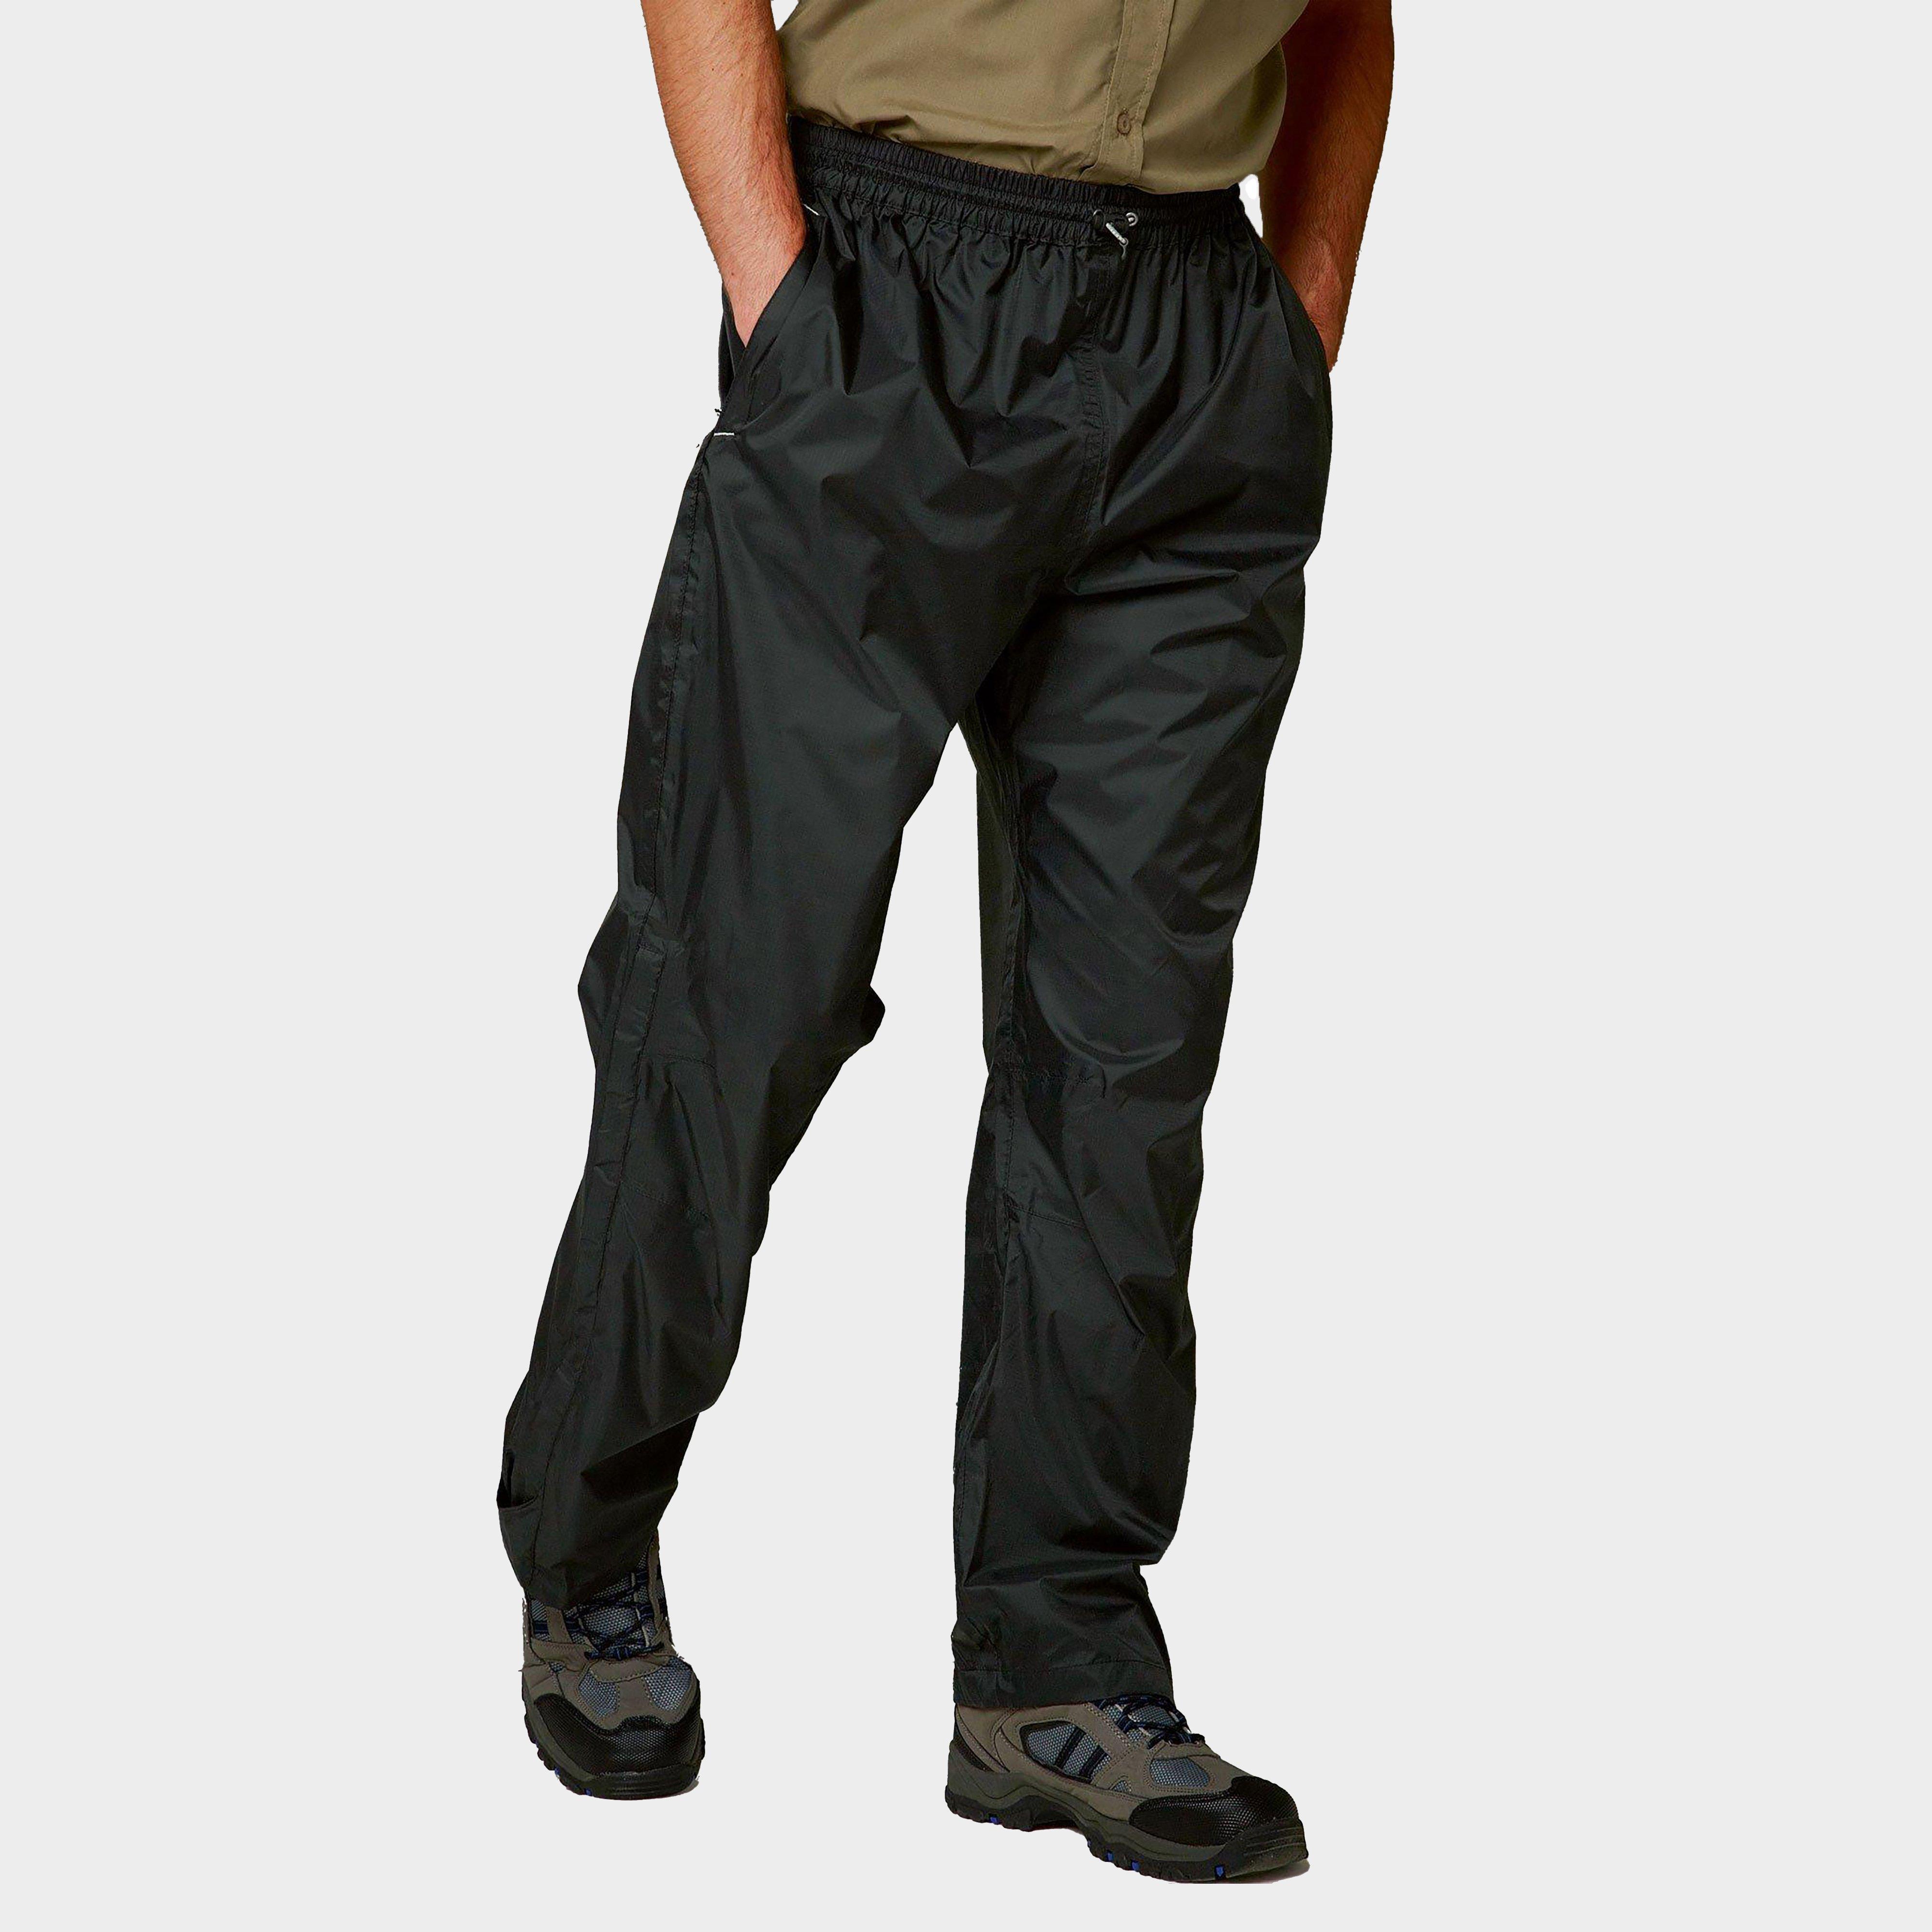 Craghoppers Craghoppers Unisex Ascent Overtrousers - Black, Black